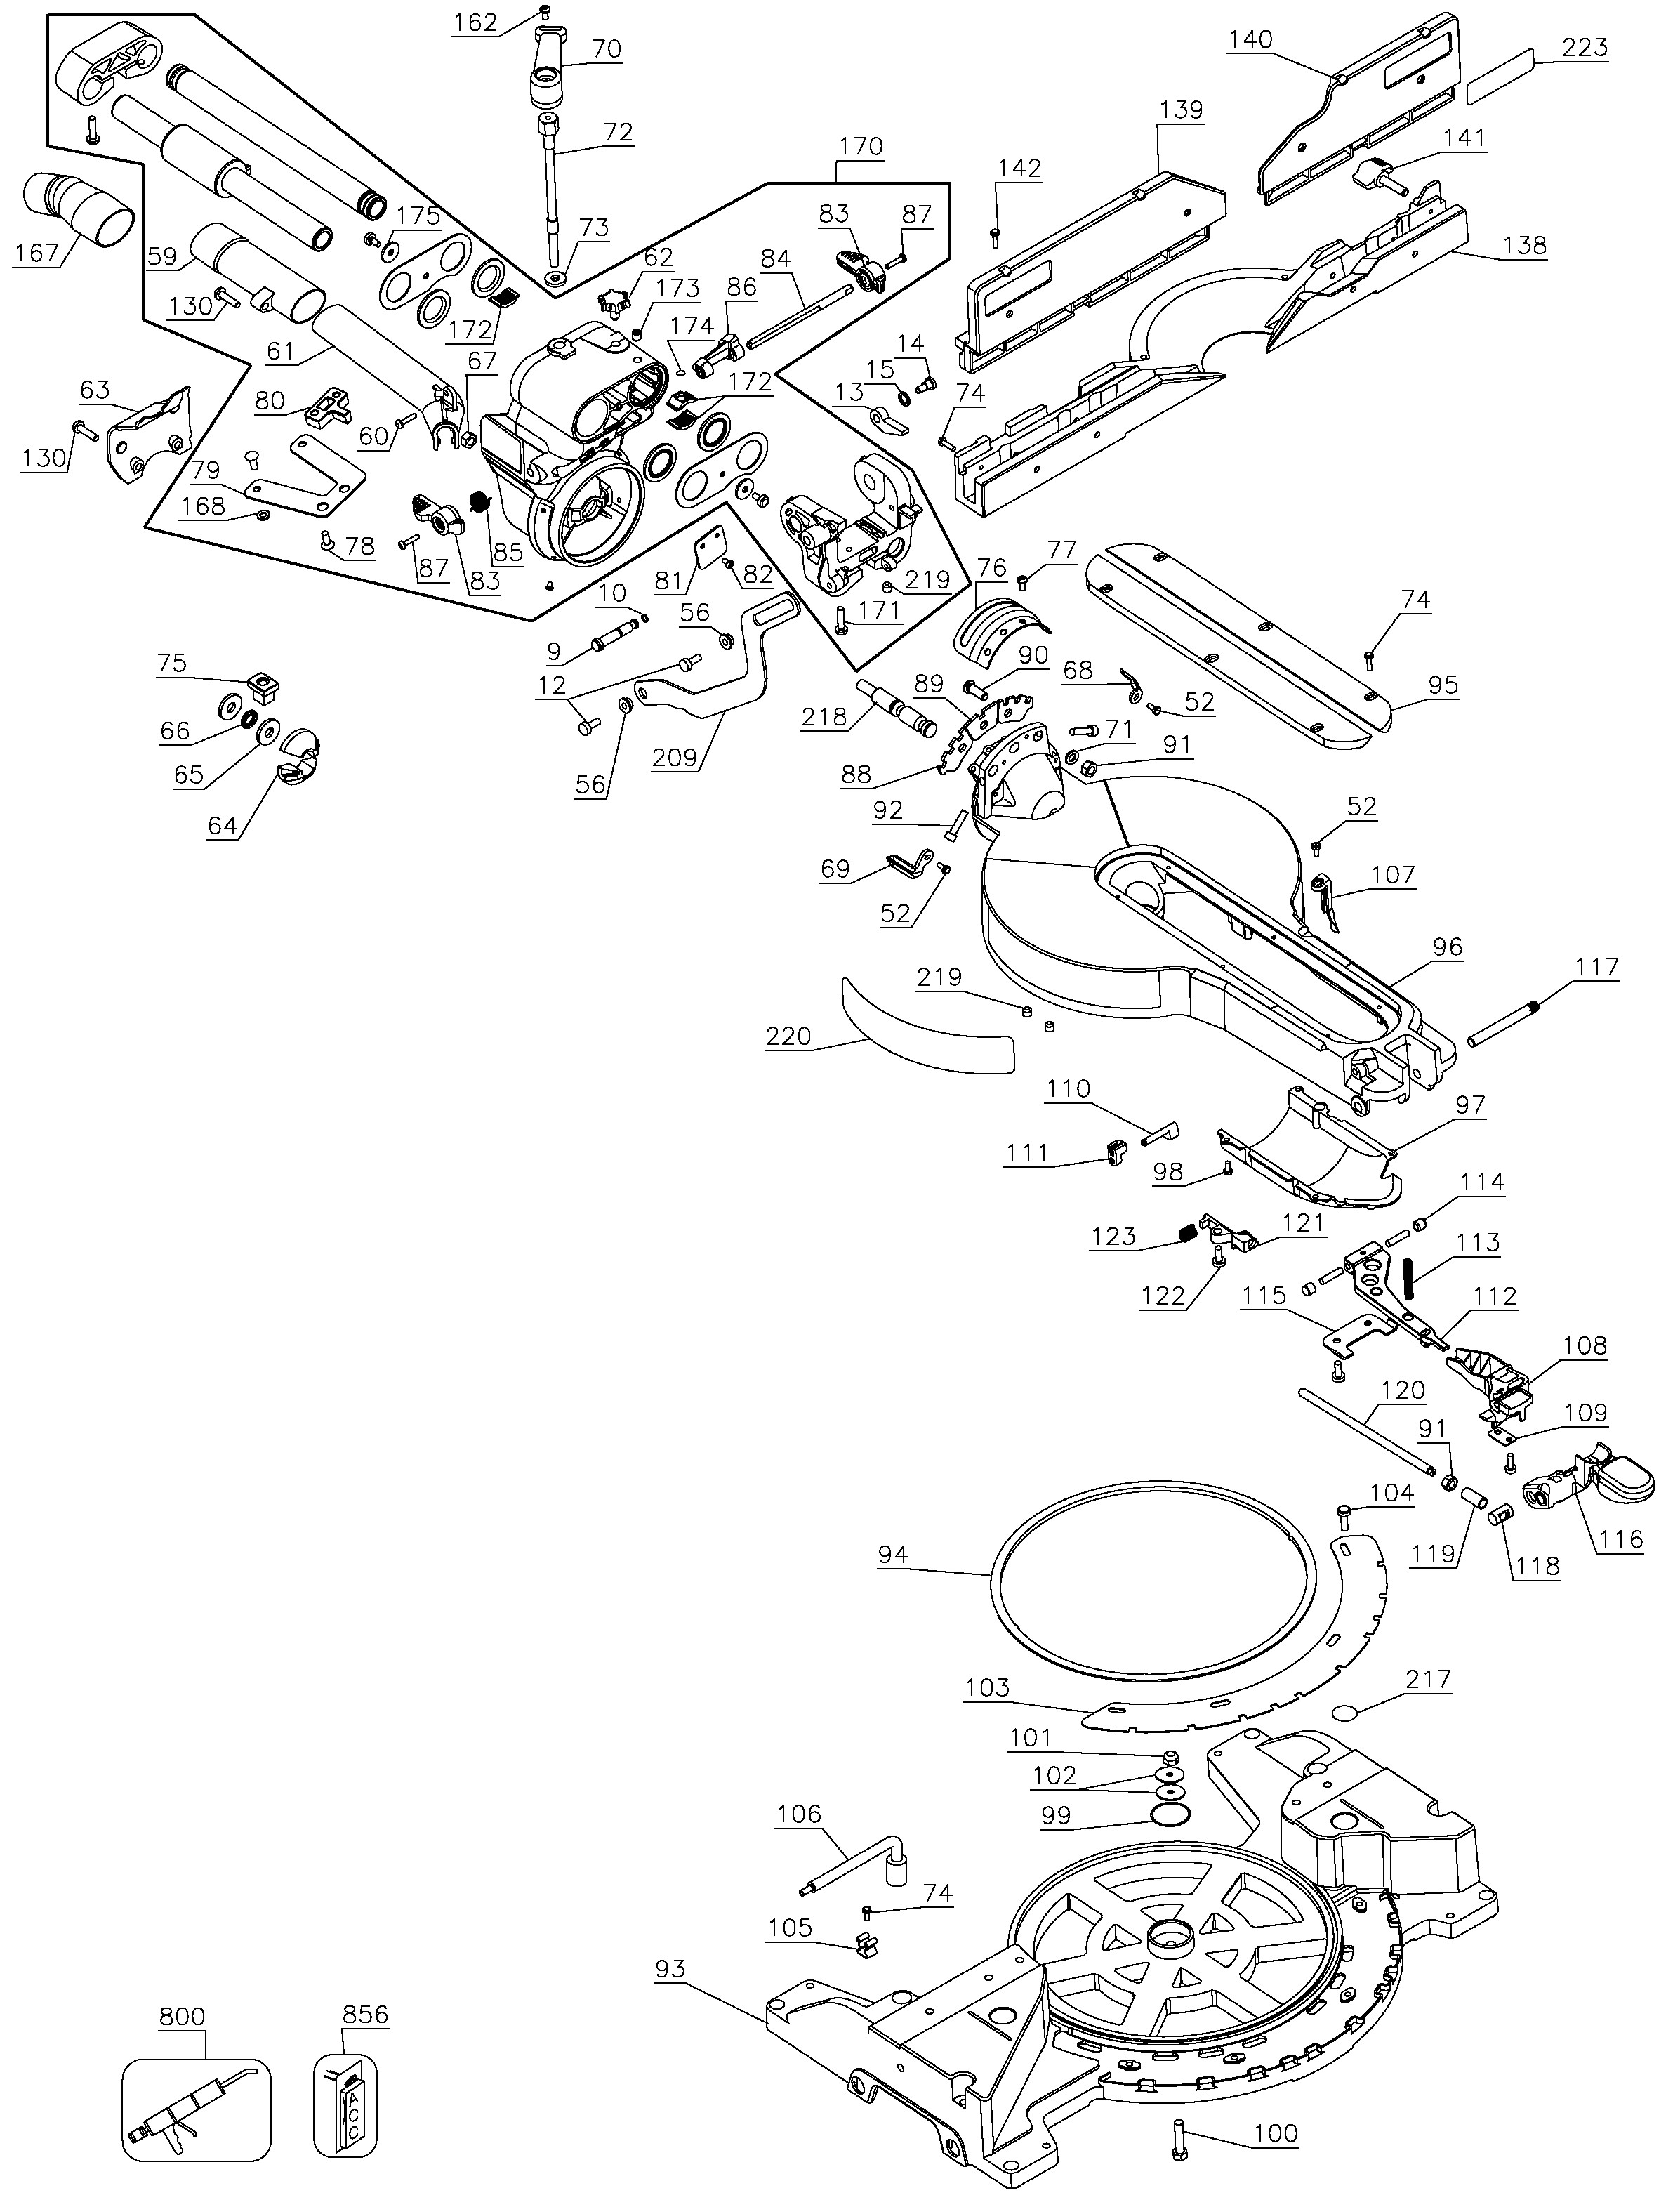 Dewalt Miter Saw Parts Diagram Dewalt Dw718 Type 1 Parts Master tool Repair Of Dewalt Miter Saw Parts Diagram